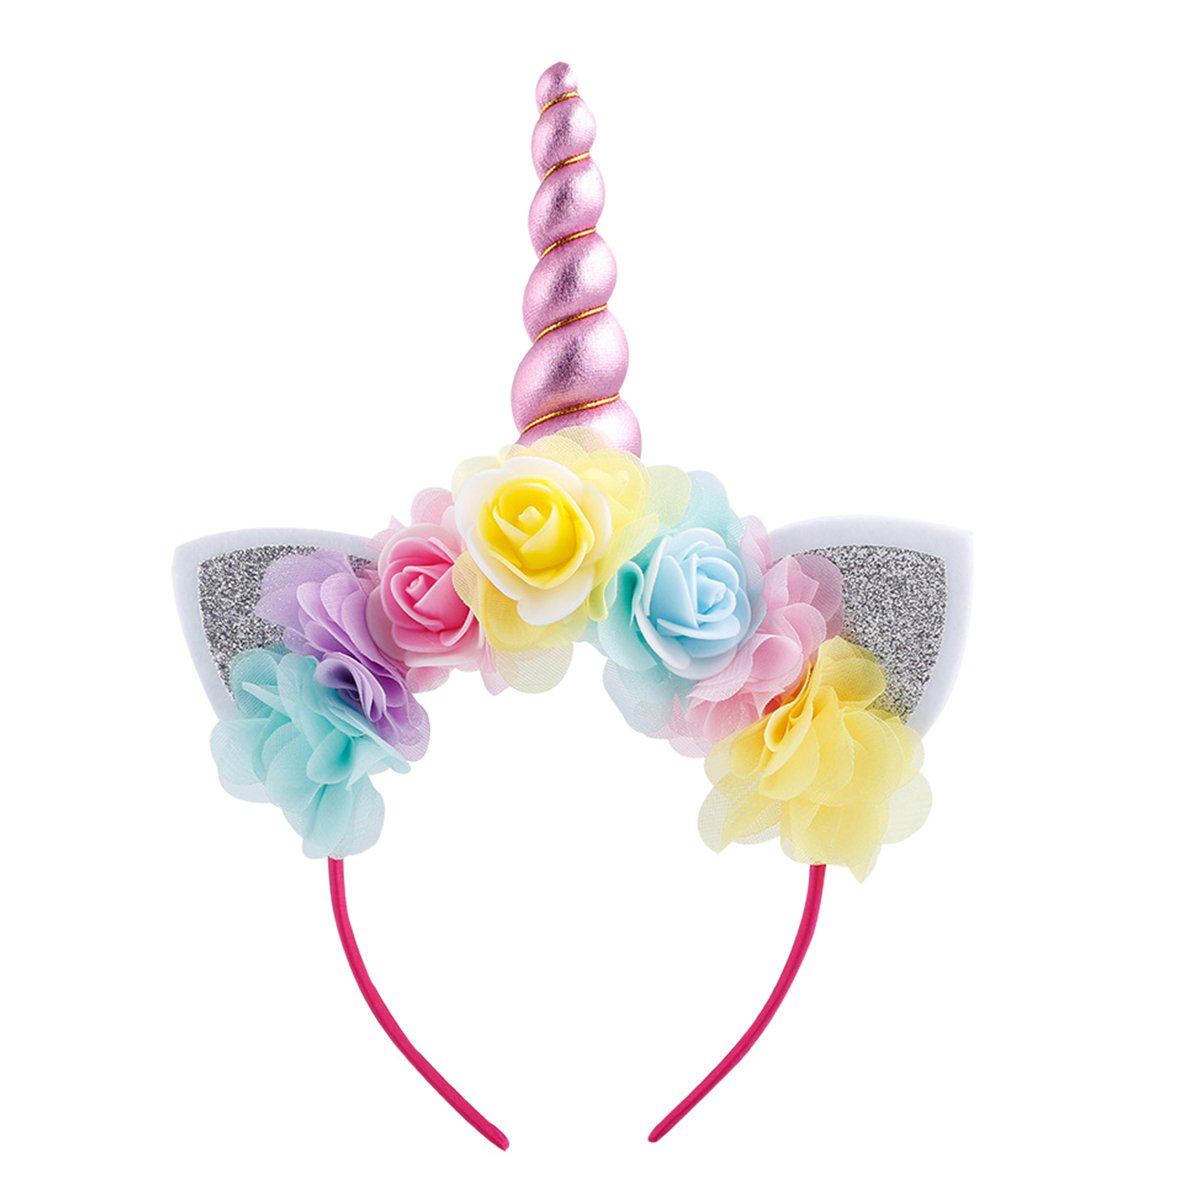 Girls Unicorn Dress up Costume Rainbow Tulle Tutu Skirt with Horn Headband Kids Birthday Outfit for Halloween Cosplay